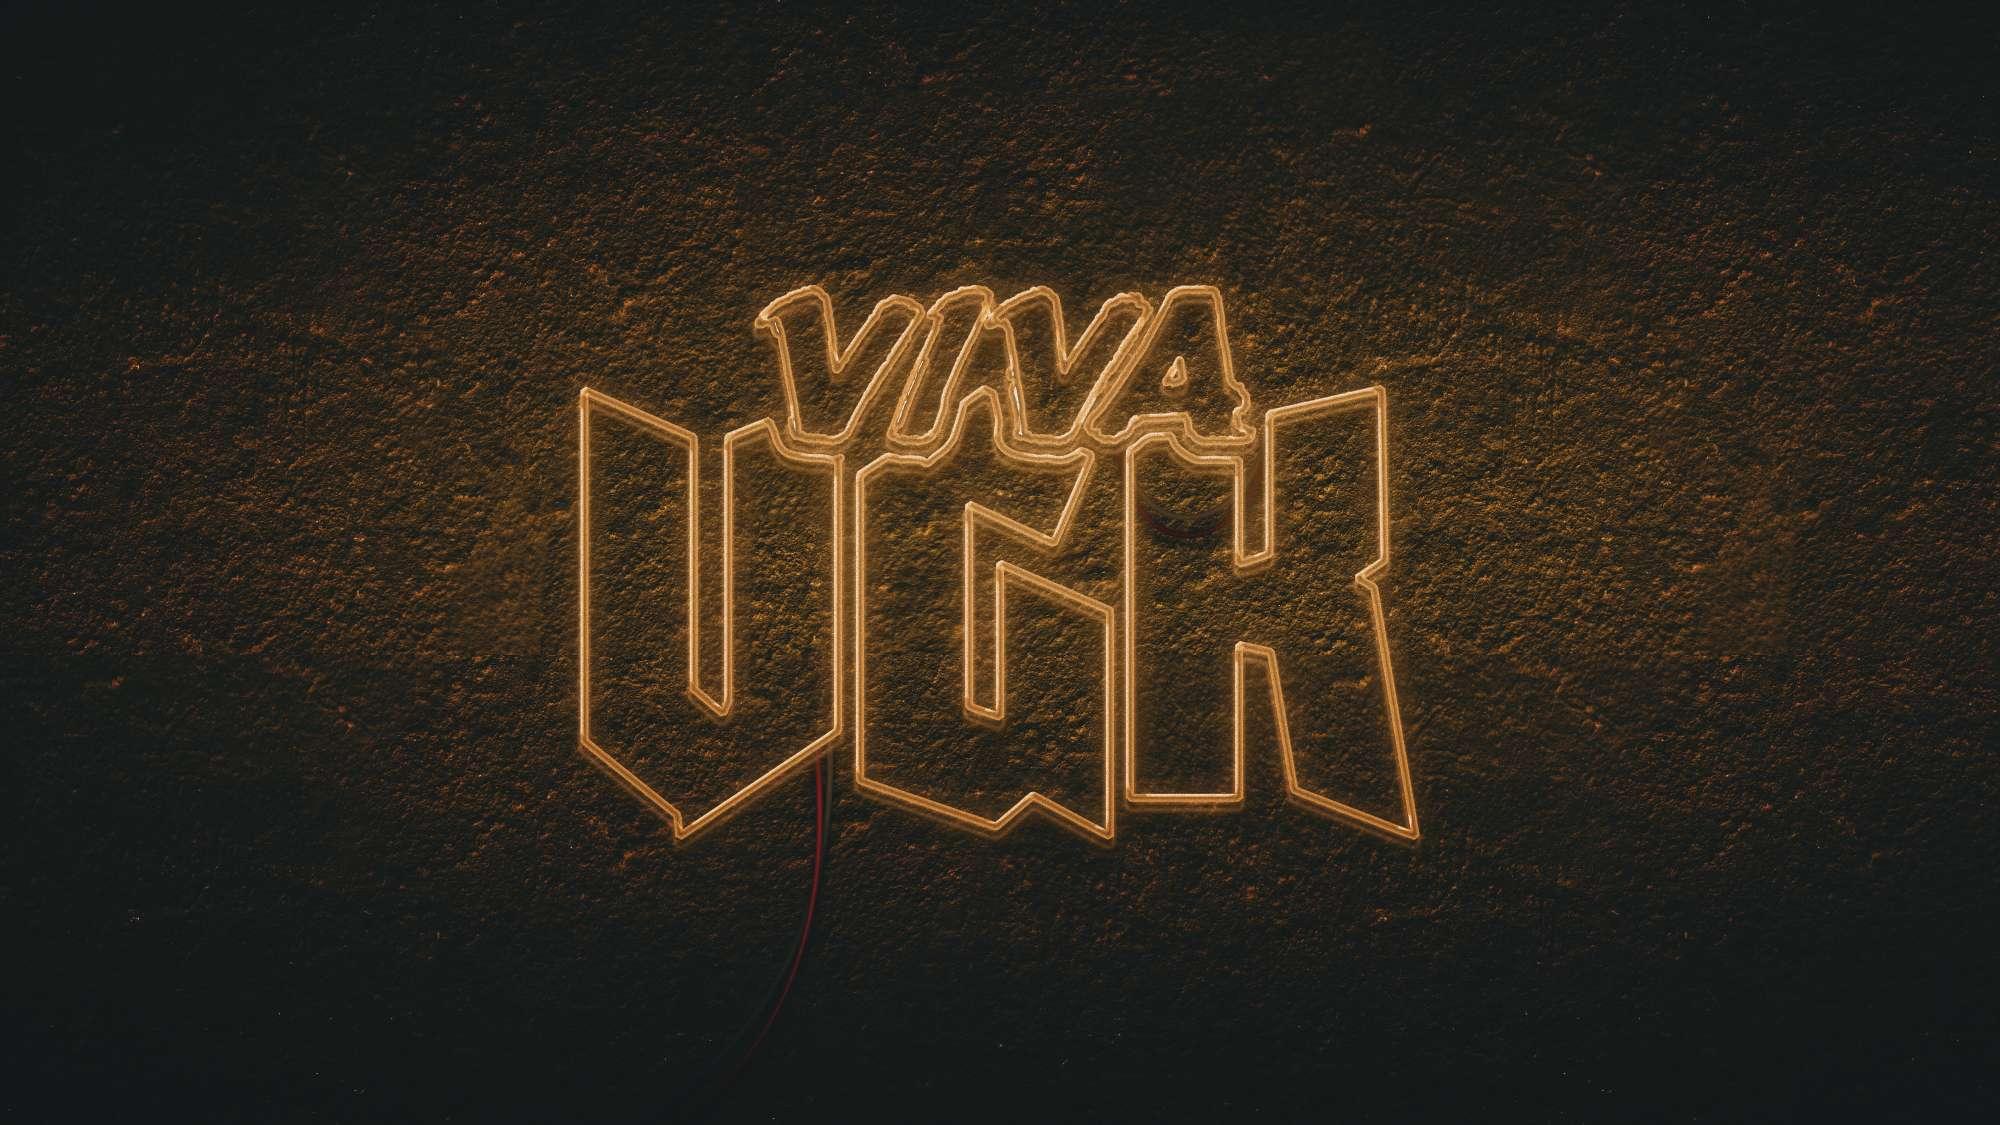 Vegas Golden Knights Wallpapers General Design Chris Creamer S